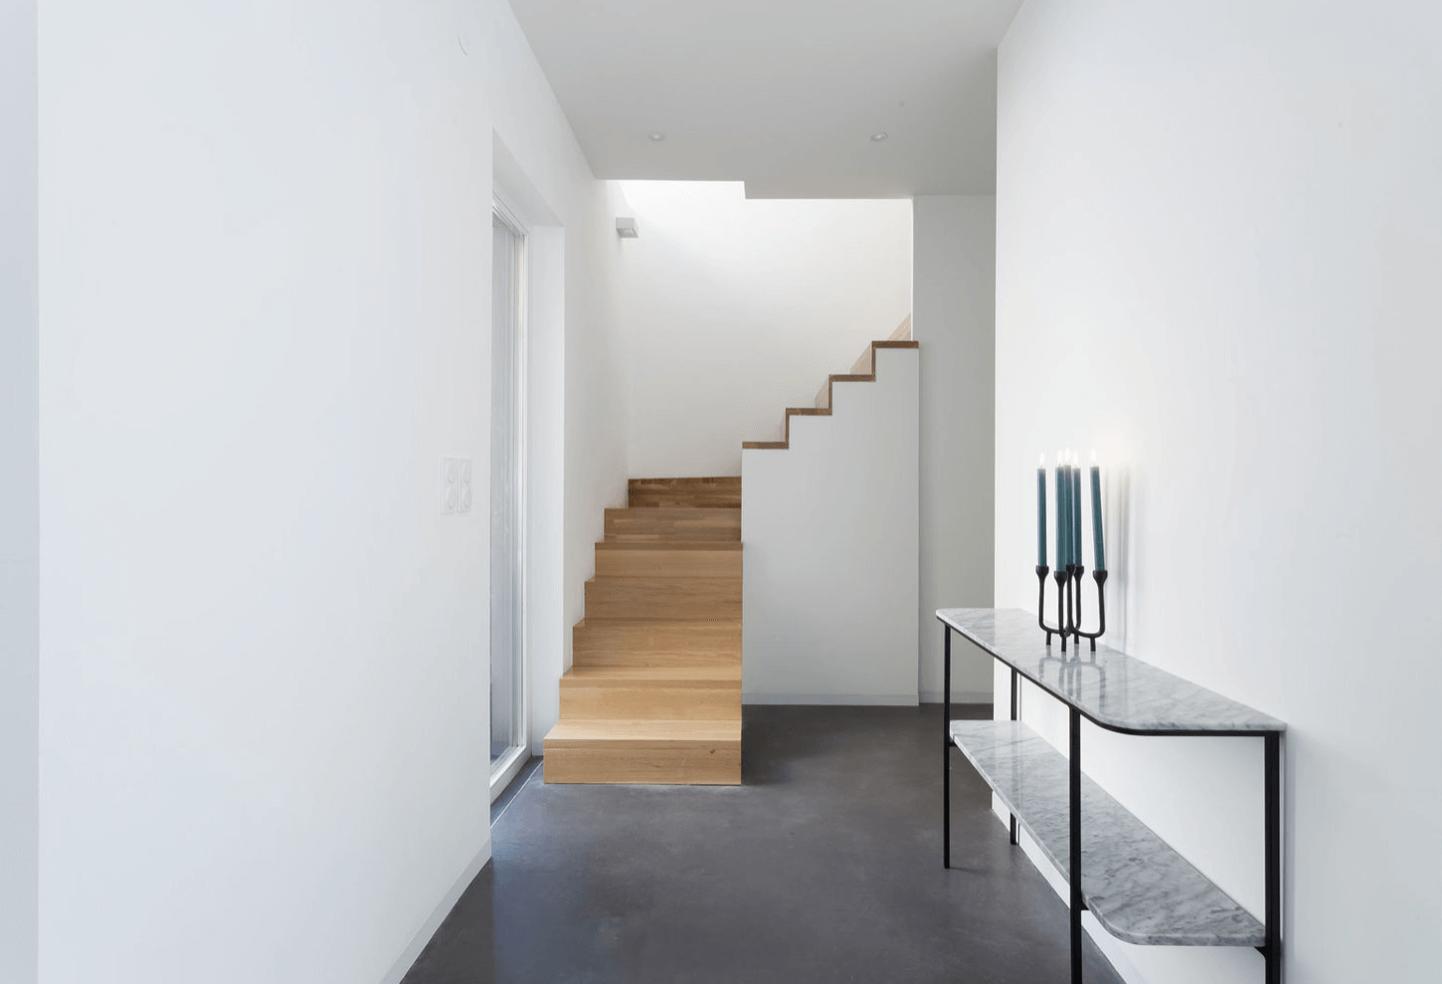 escalier tournant blanc bois